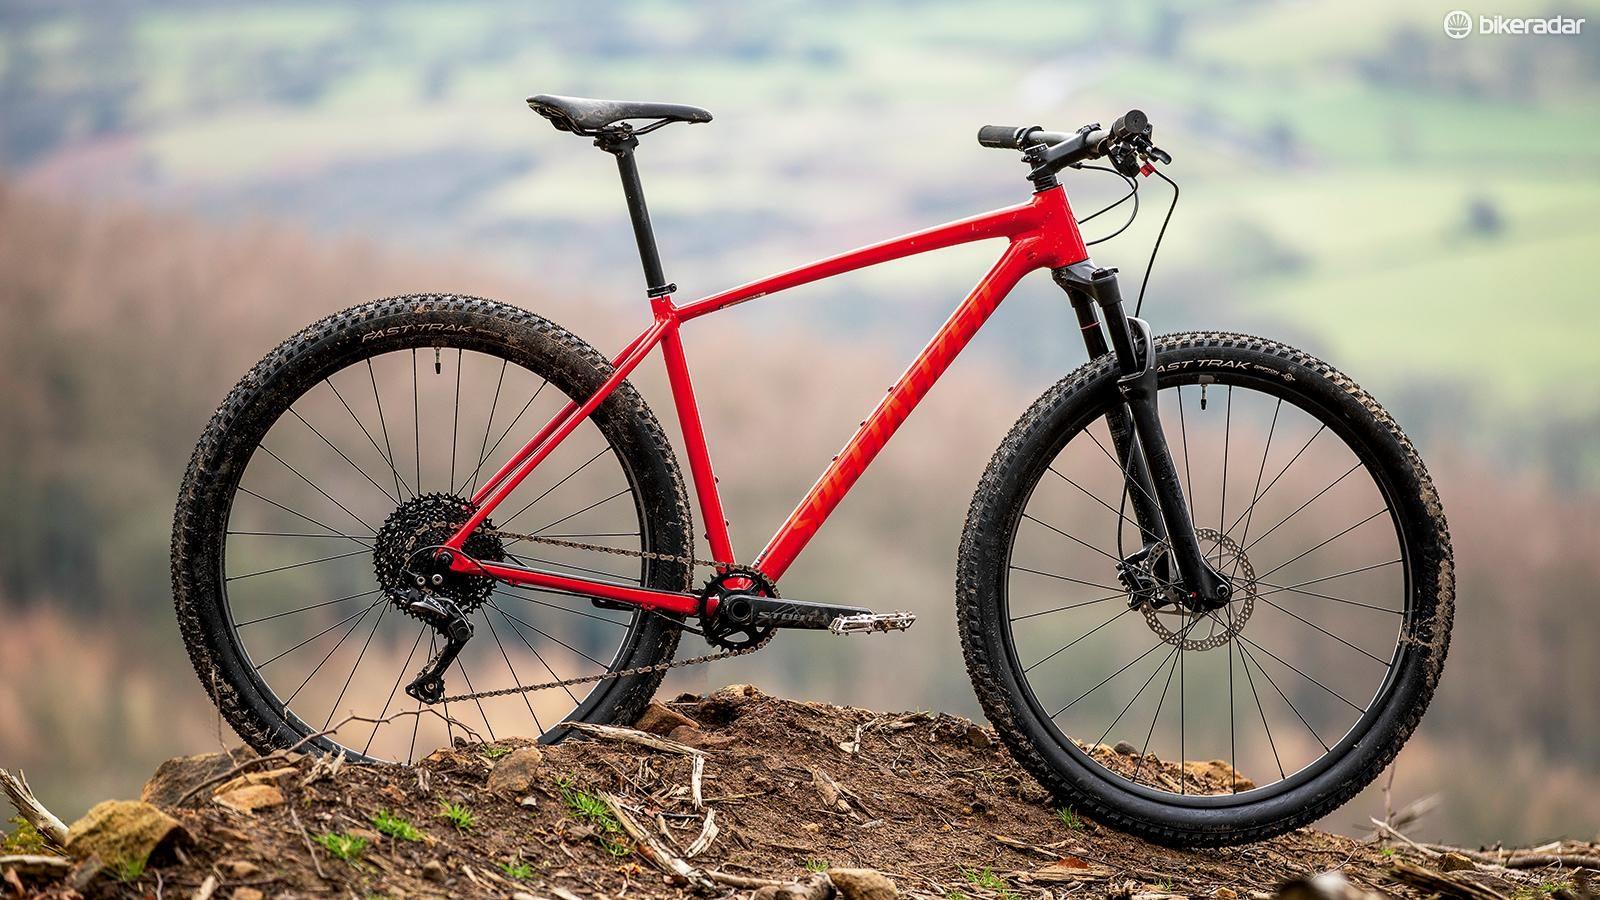 Bicycle Cable Adjuster M5 MTB Road Bike Derailleur Index Shifter Housing Screws